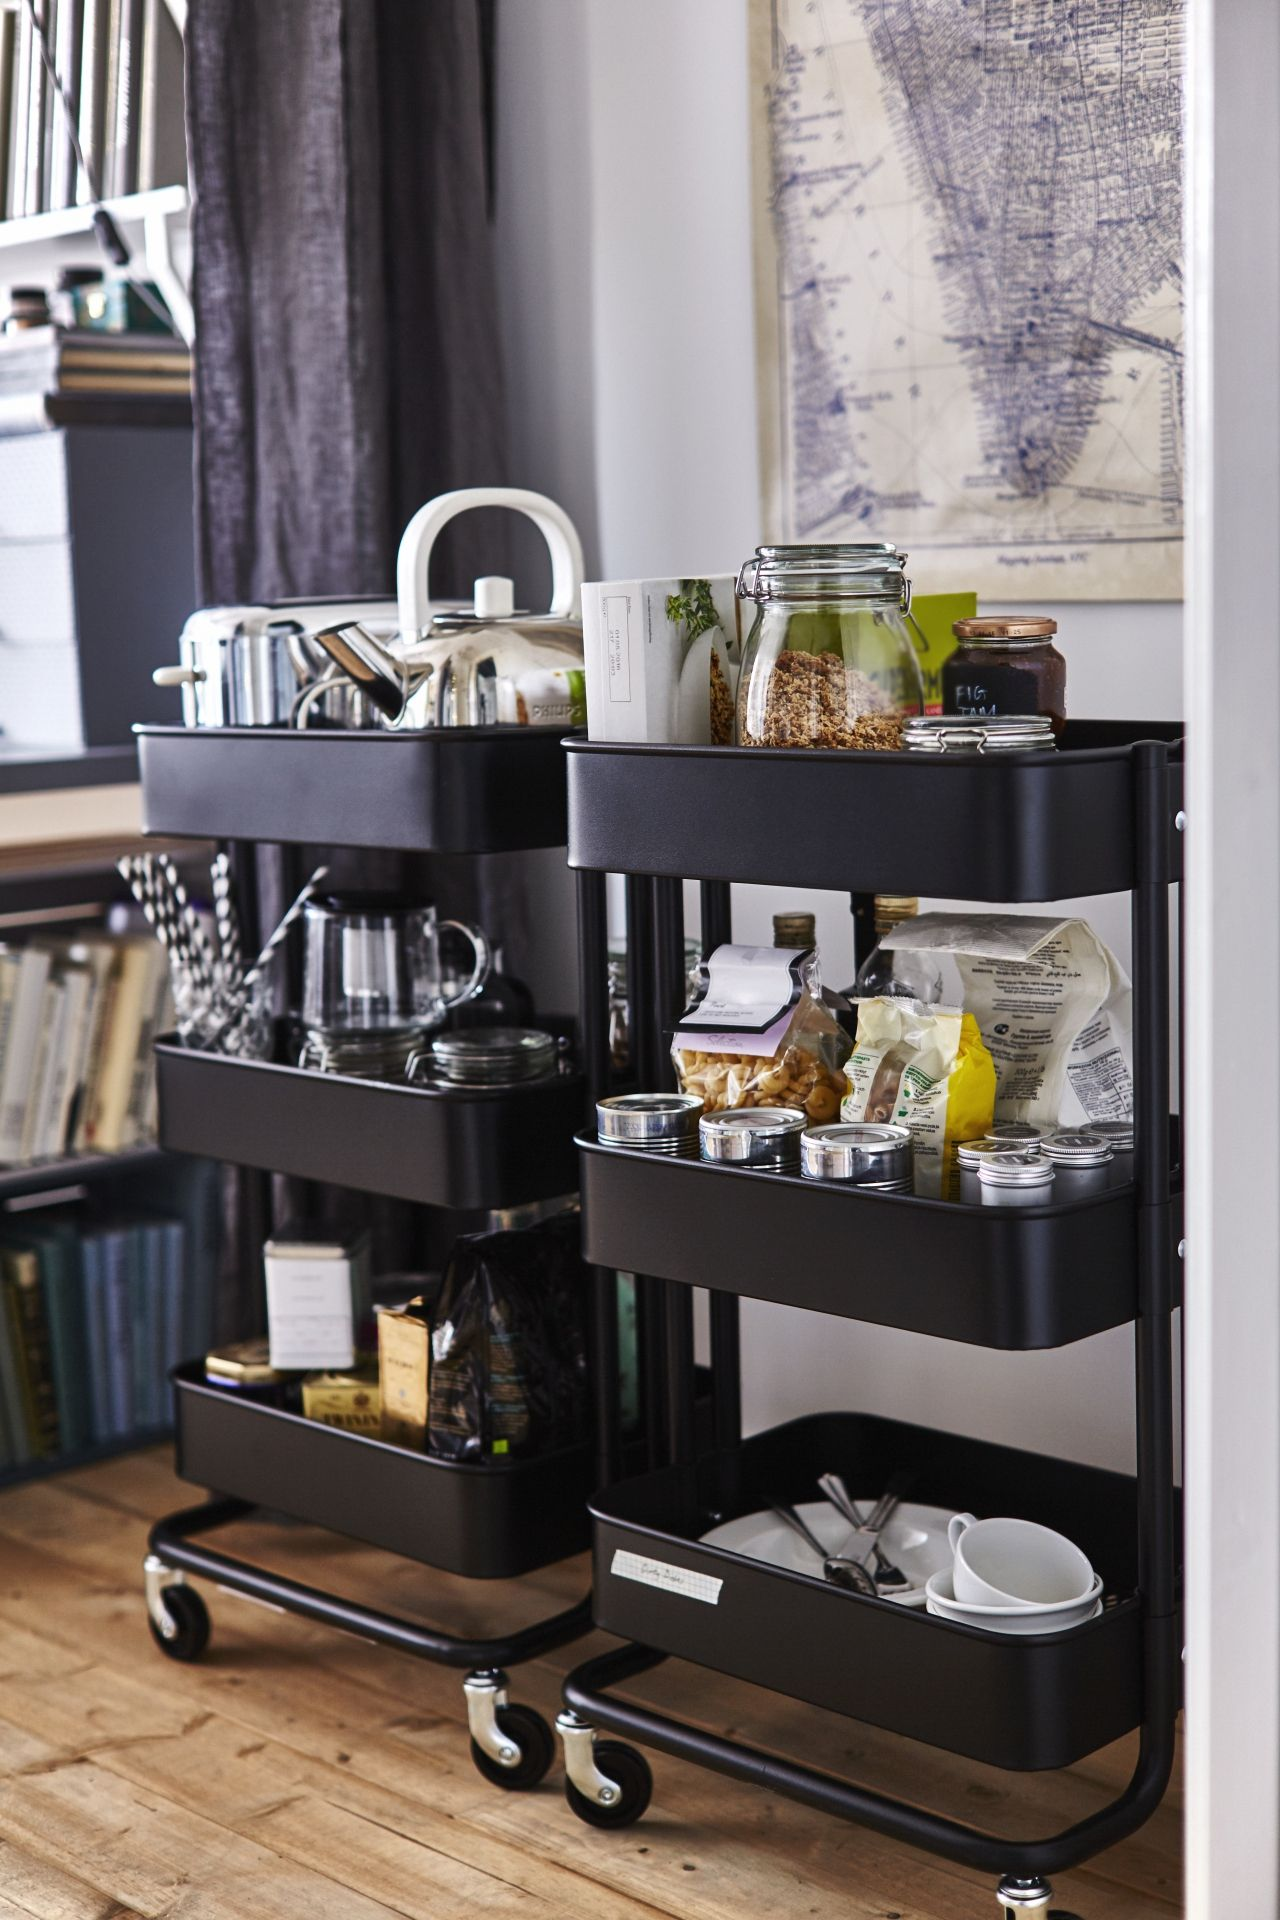 Pin en Kitchens & Pantries